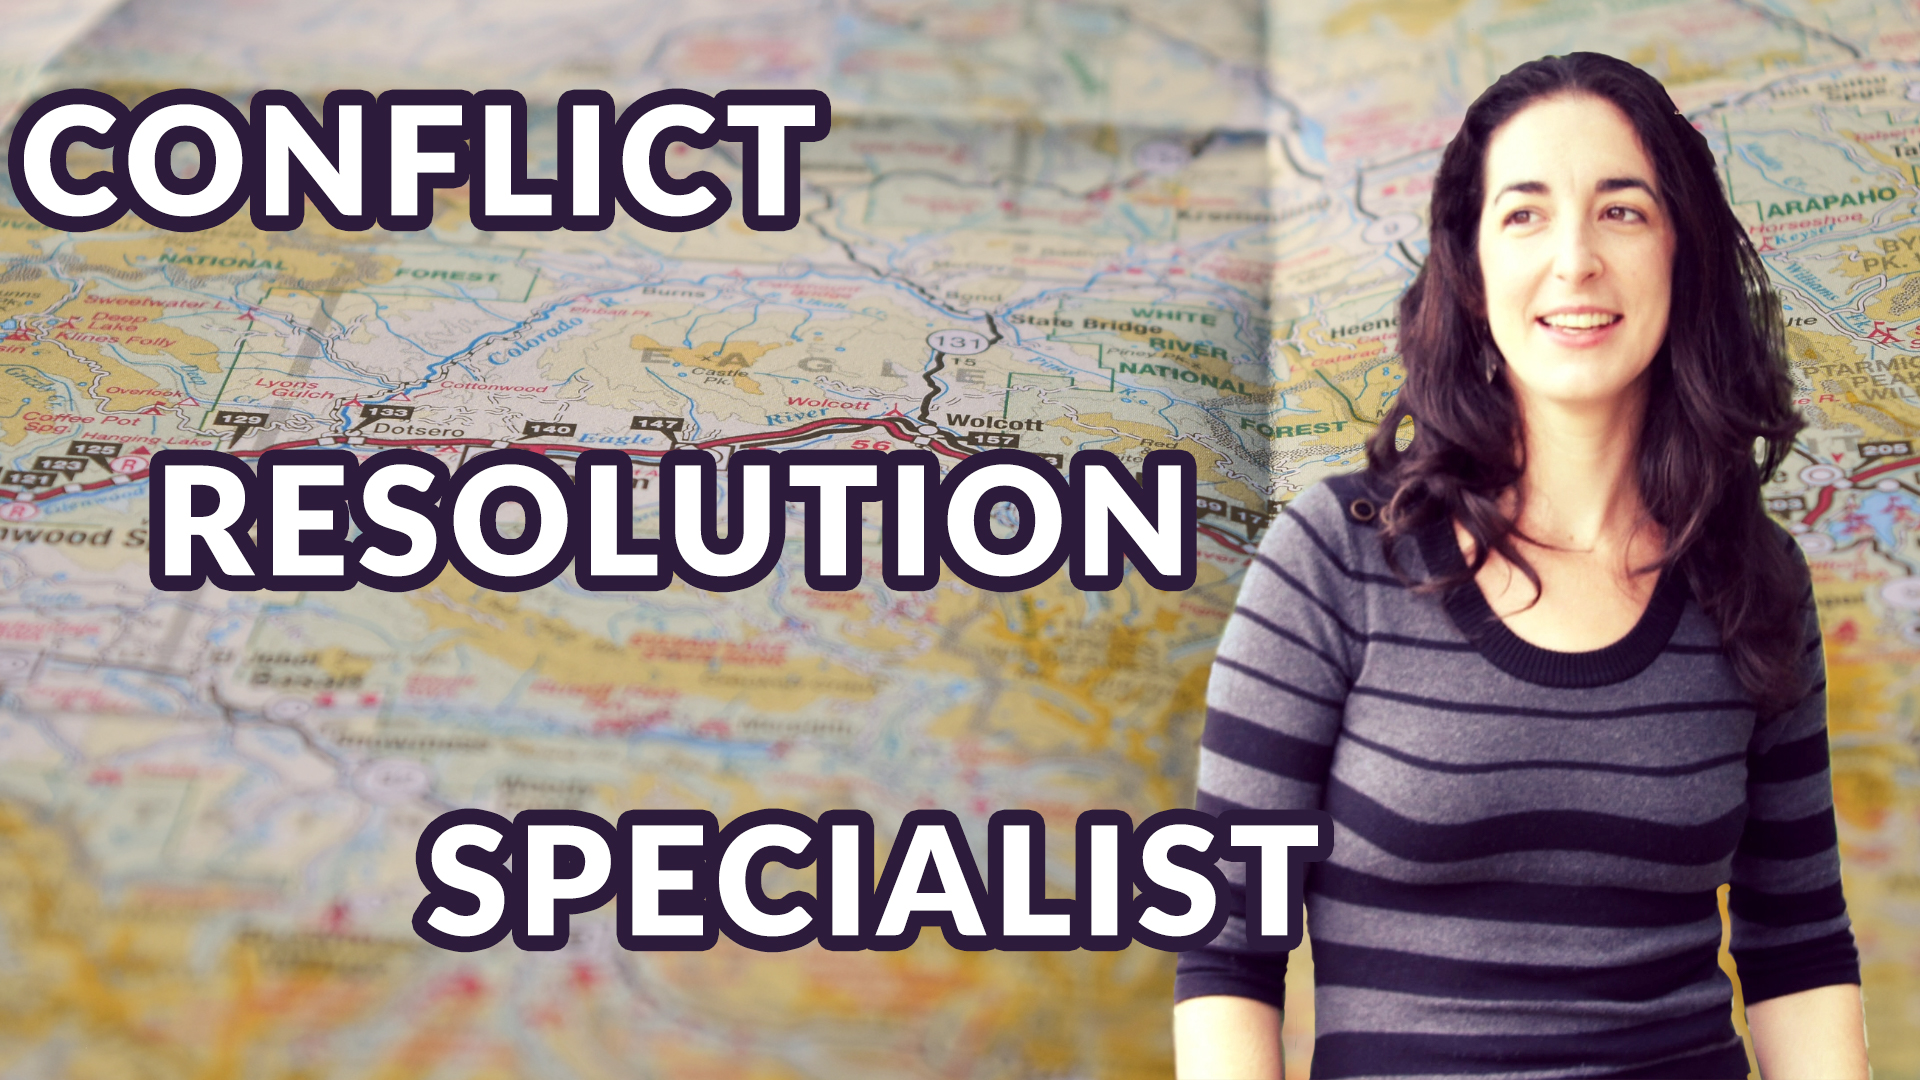 CONFLICT RESOLUTION SPECIALIST ROBIN FUNSTEN | AREN 97